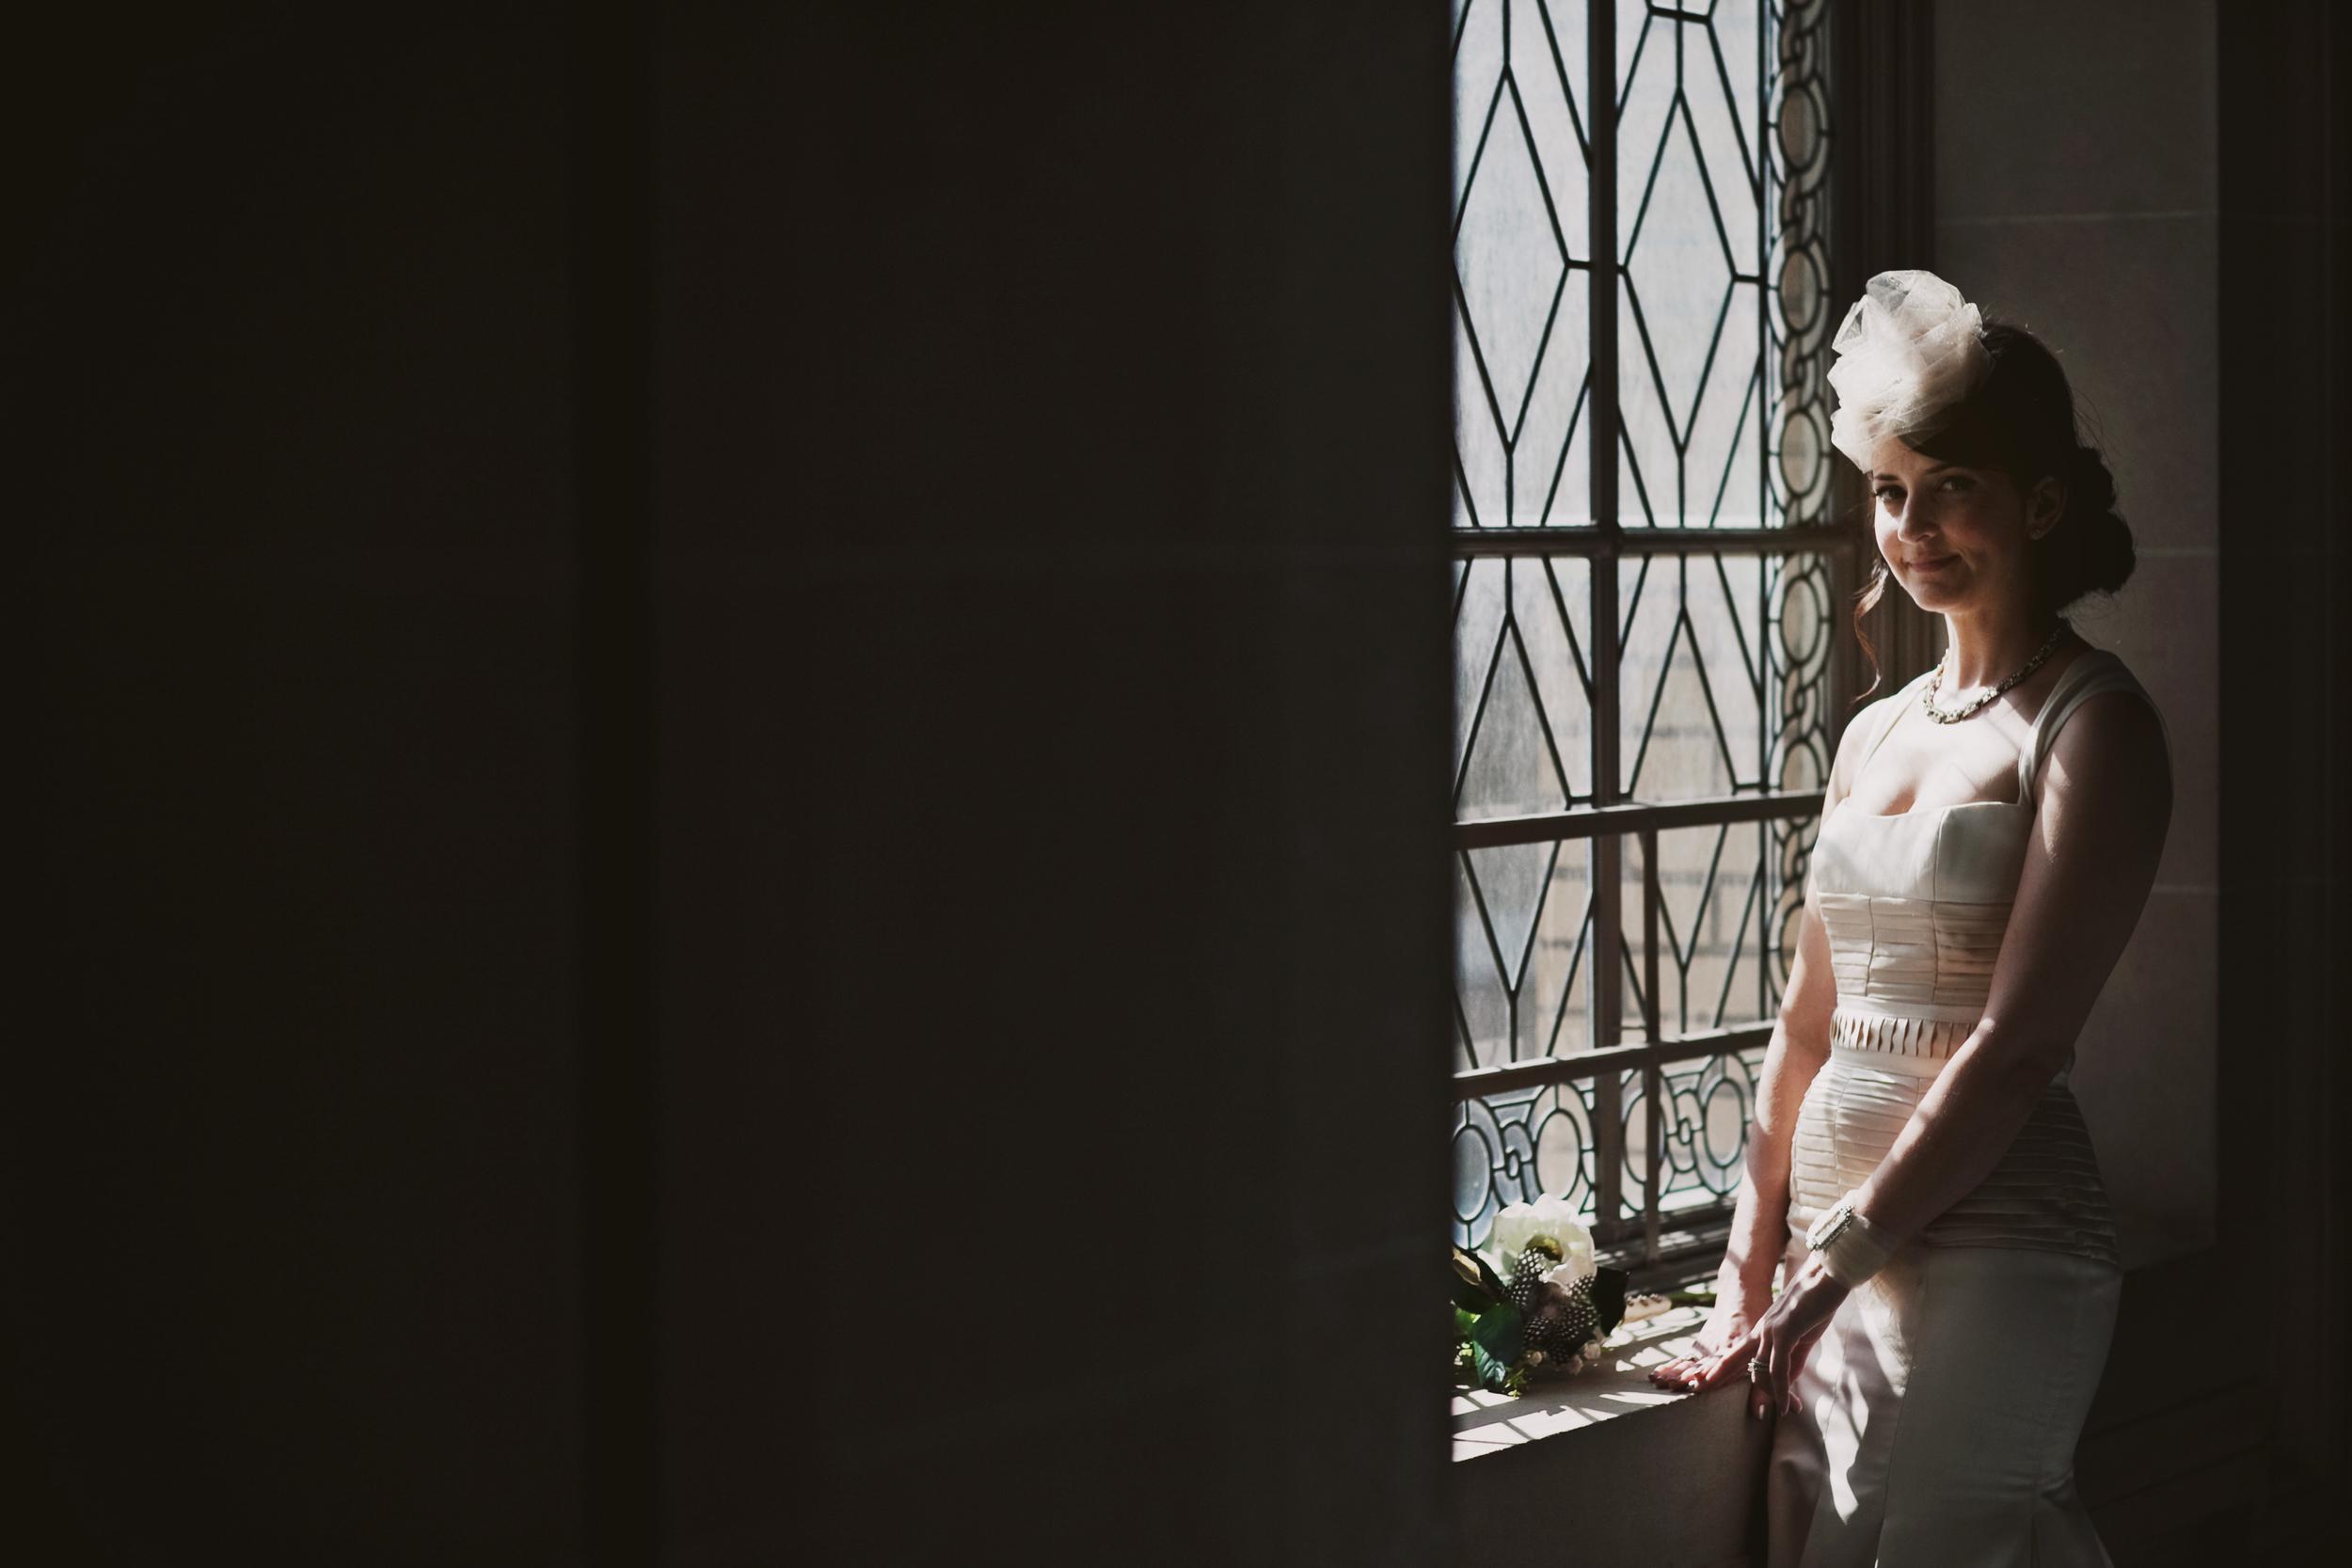 San_Francisco_City_Hall_Wedding_Photography_Cori_EB-12.JPG